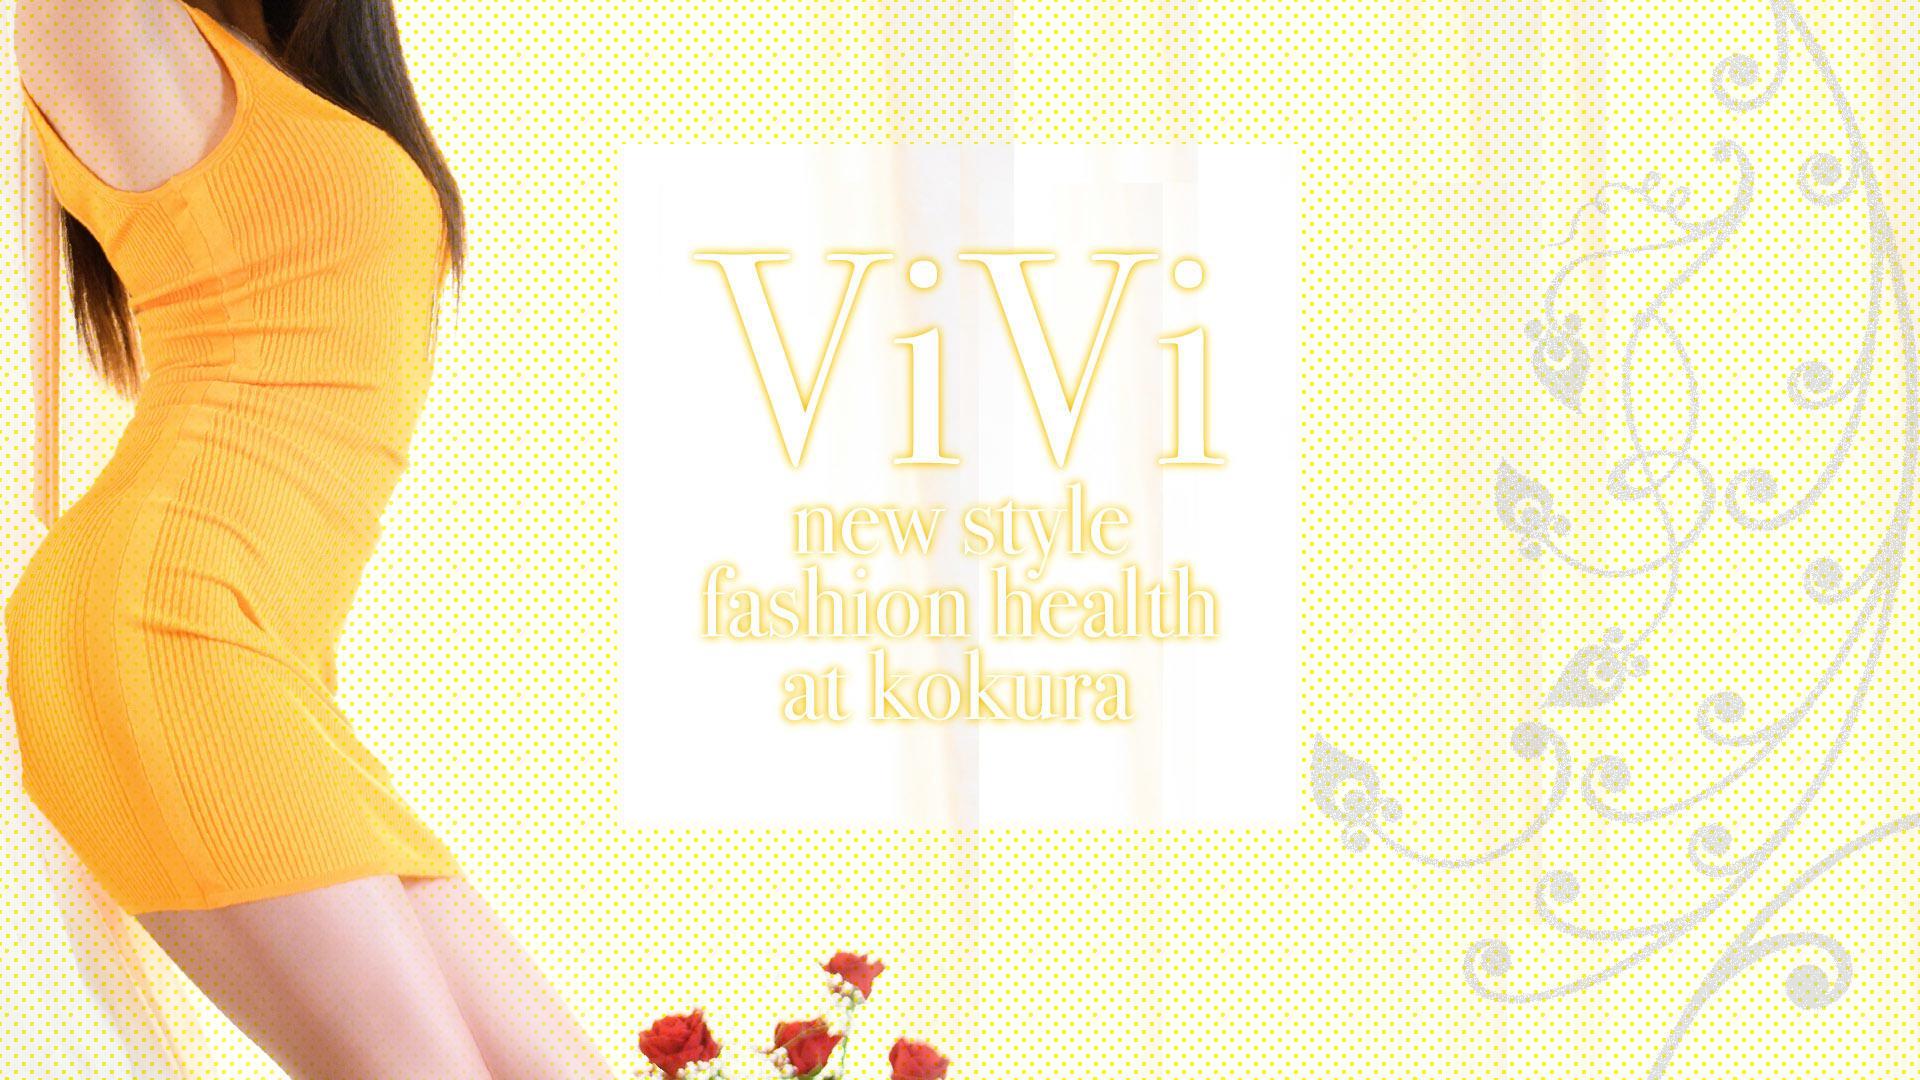 VIVI(ヴィヴィ)